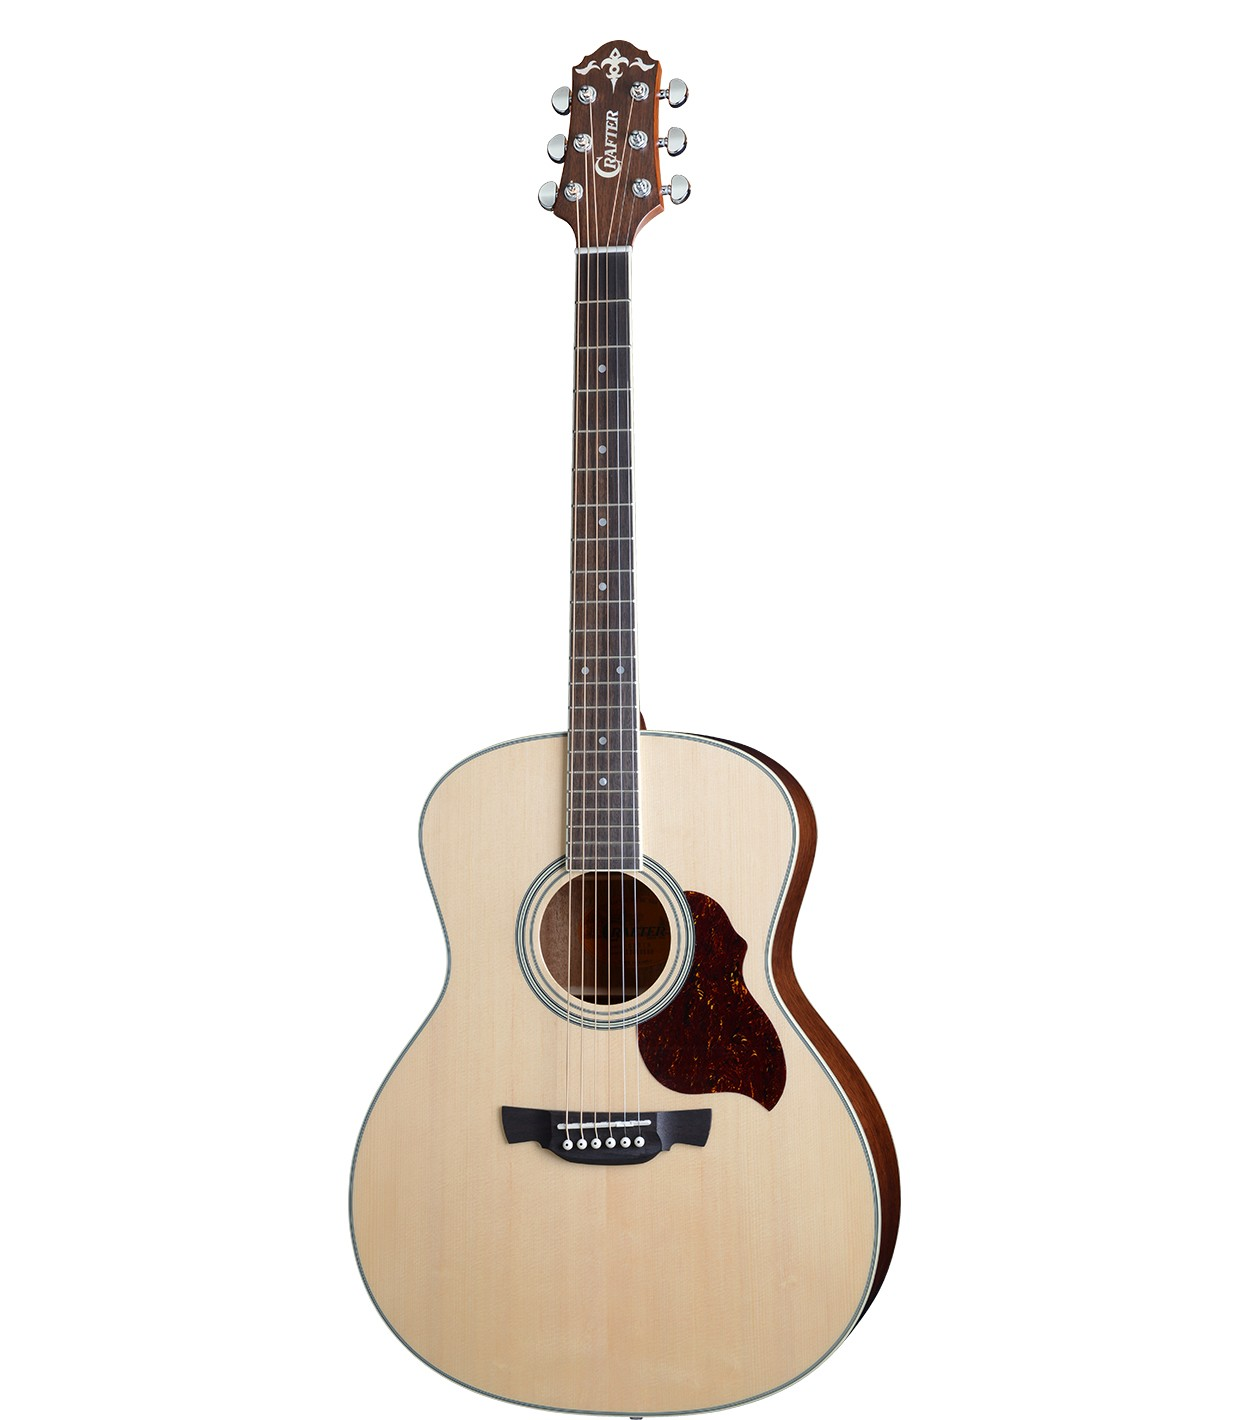 CRAFTER GA-6/NС   Чехол - акустическая гитара Гранд Аудиториум- верх-цел. ель, корпус-махагон, натур